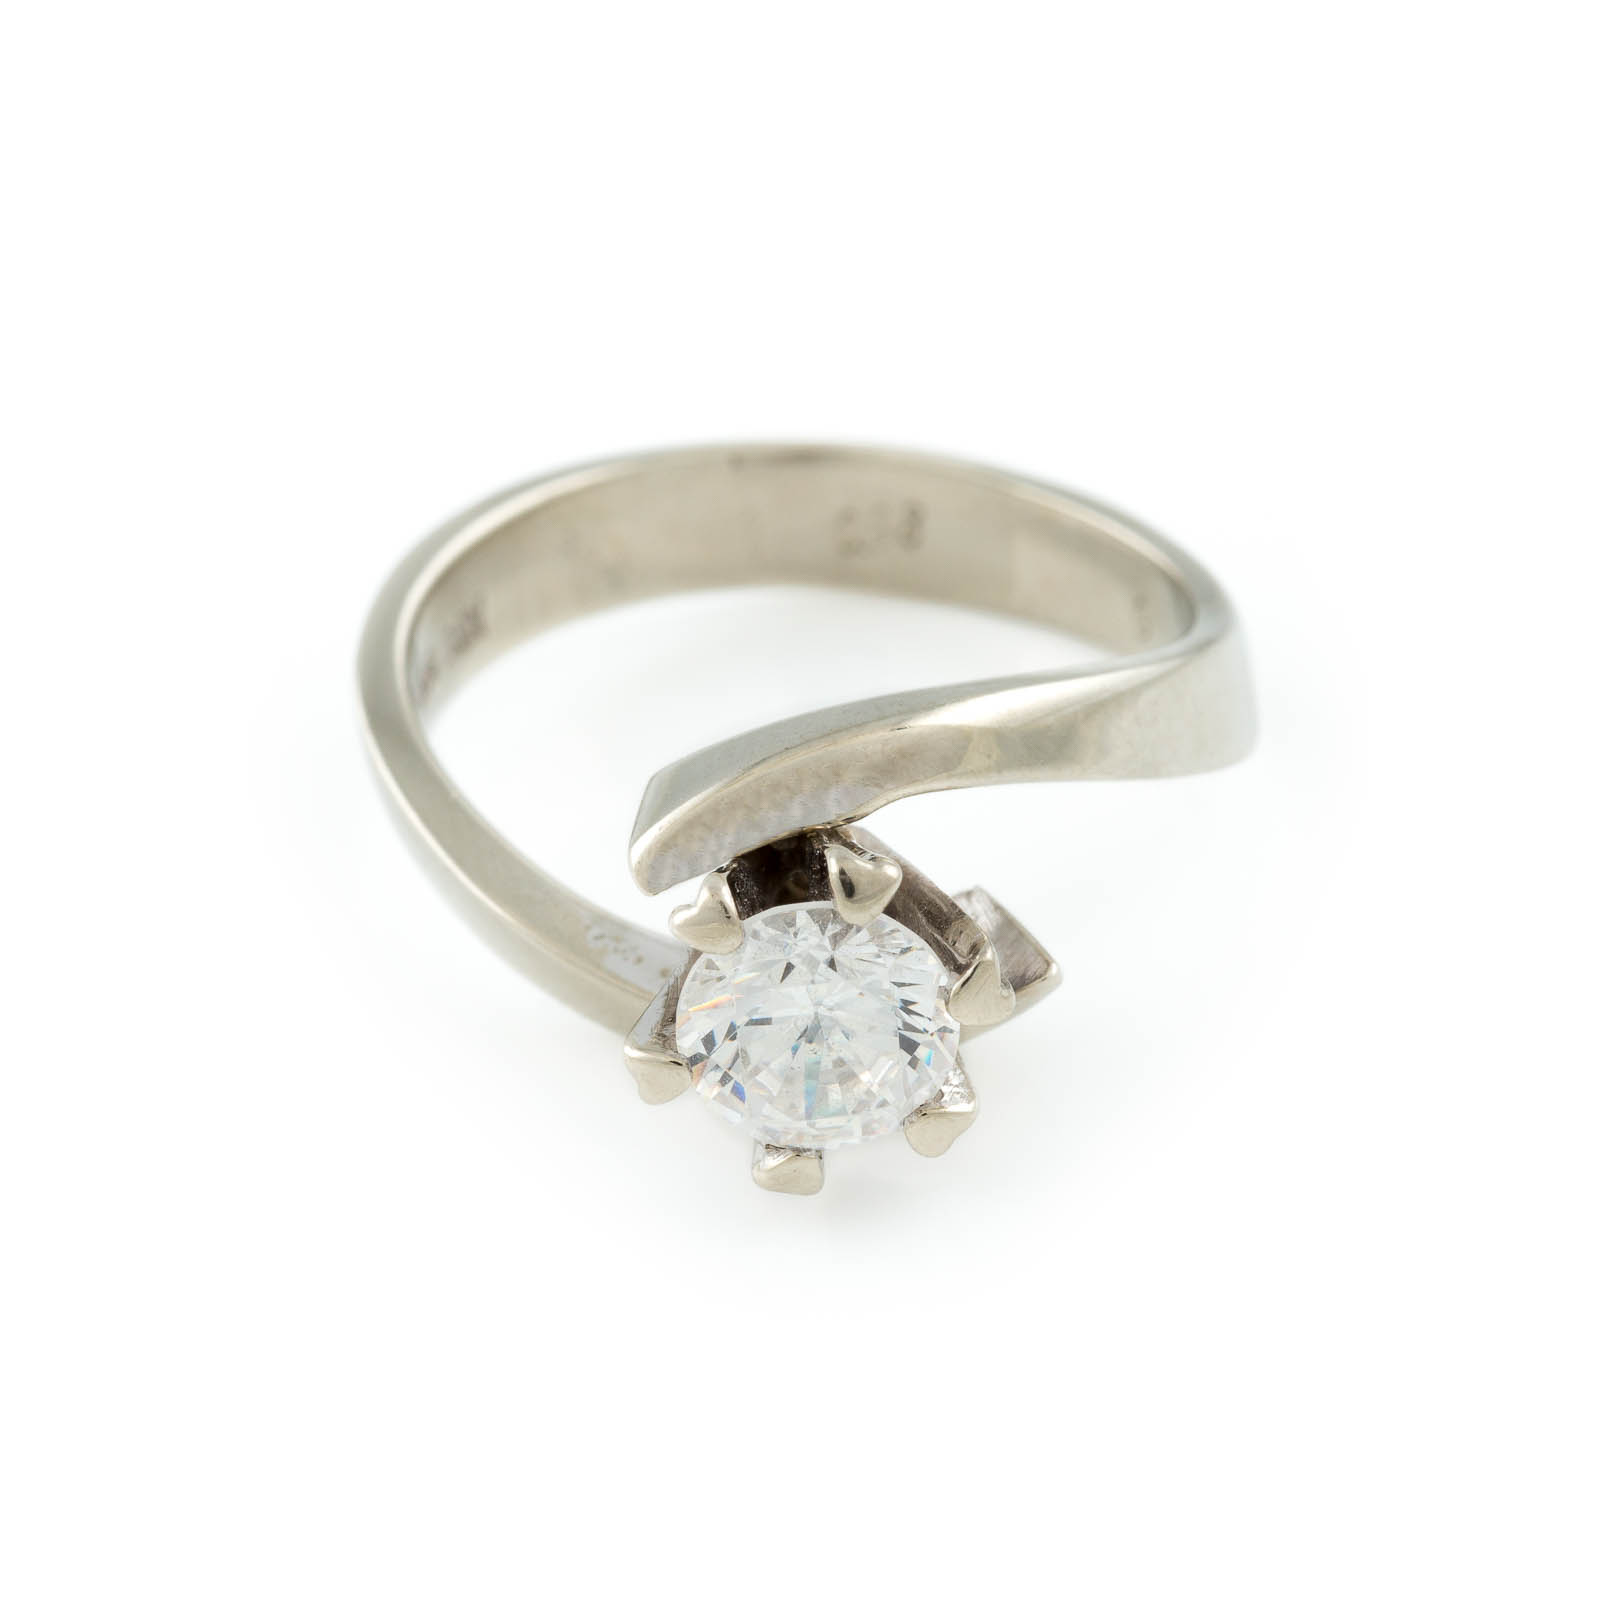 BRILLANT-RING Weißgold. Ringmaß ca. 54, Ges.-Gew. ca. 4,5 g. Gest. 585, Caratangabe des Diamanten,